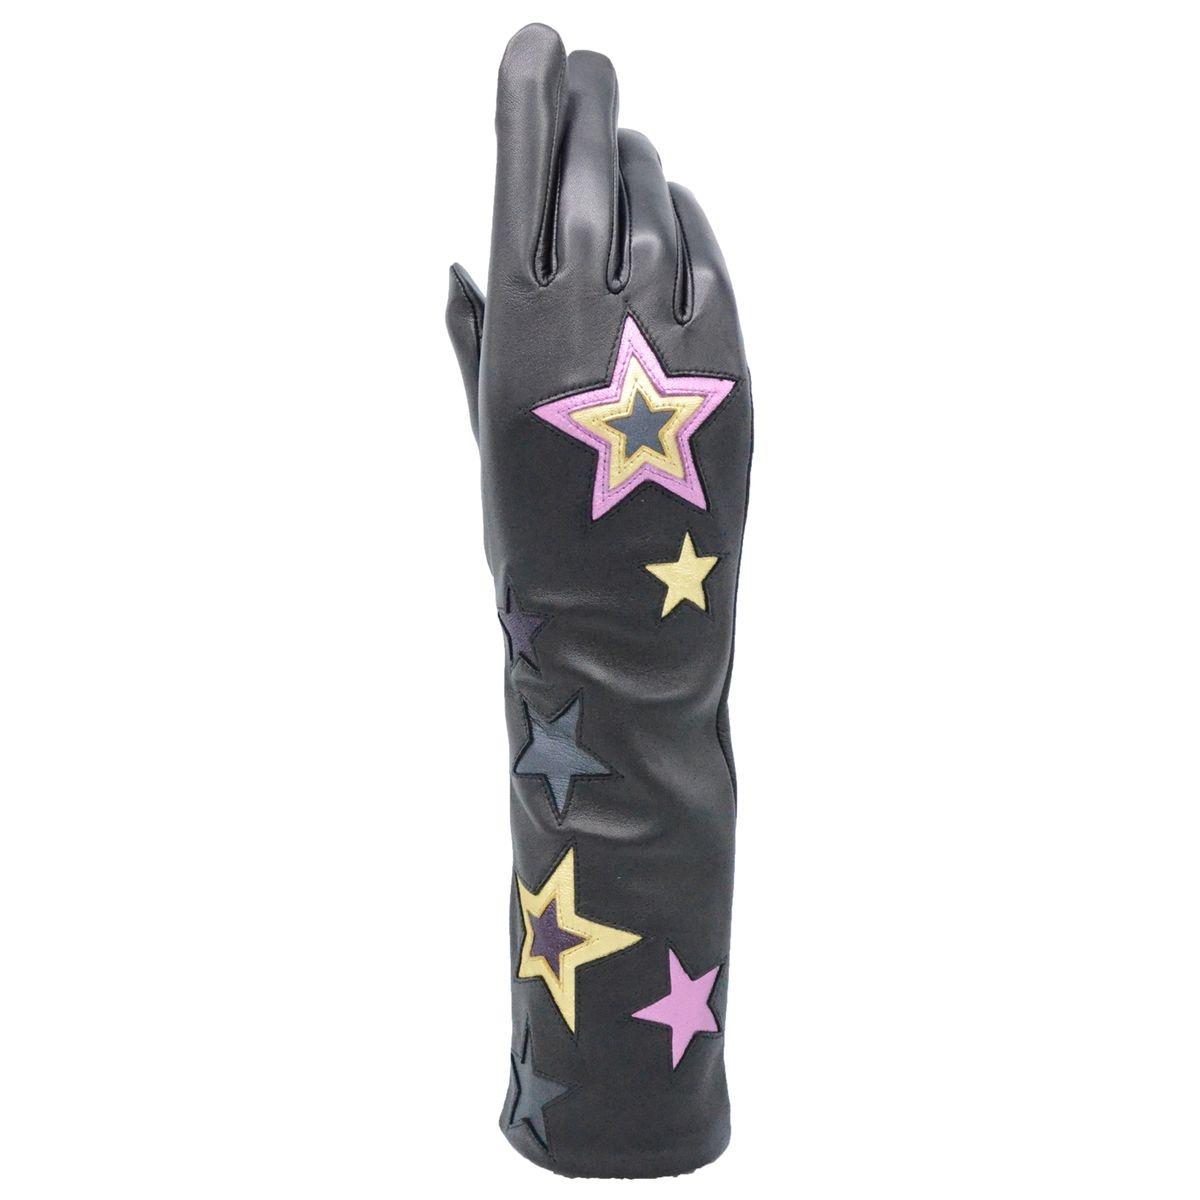 Gants en cuir femme Stars tactile